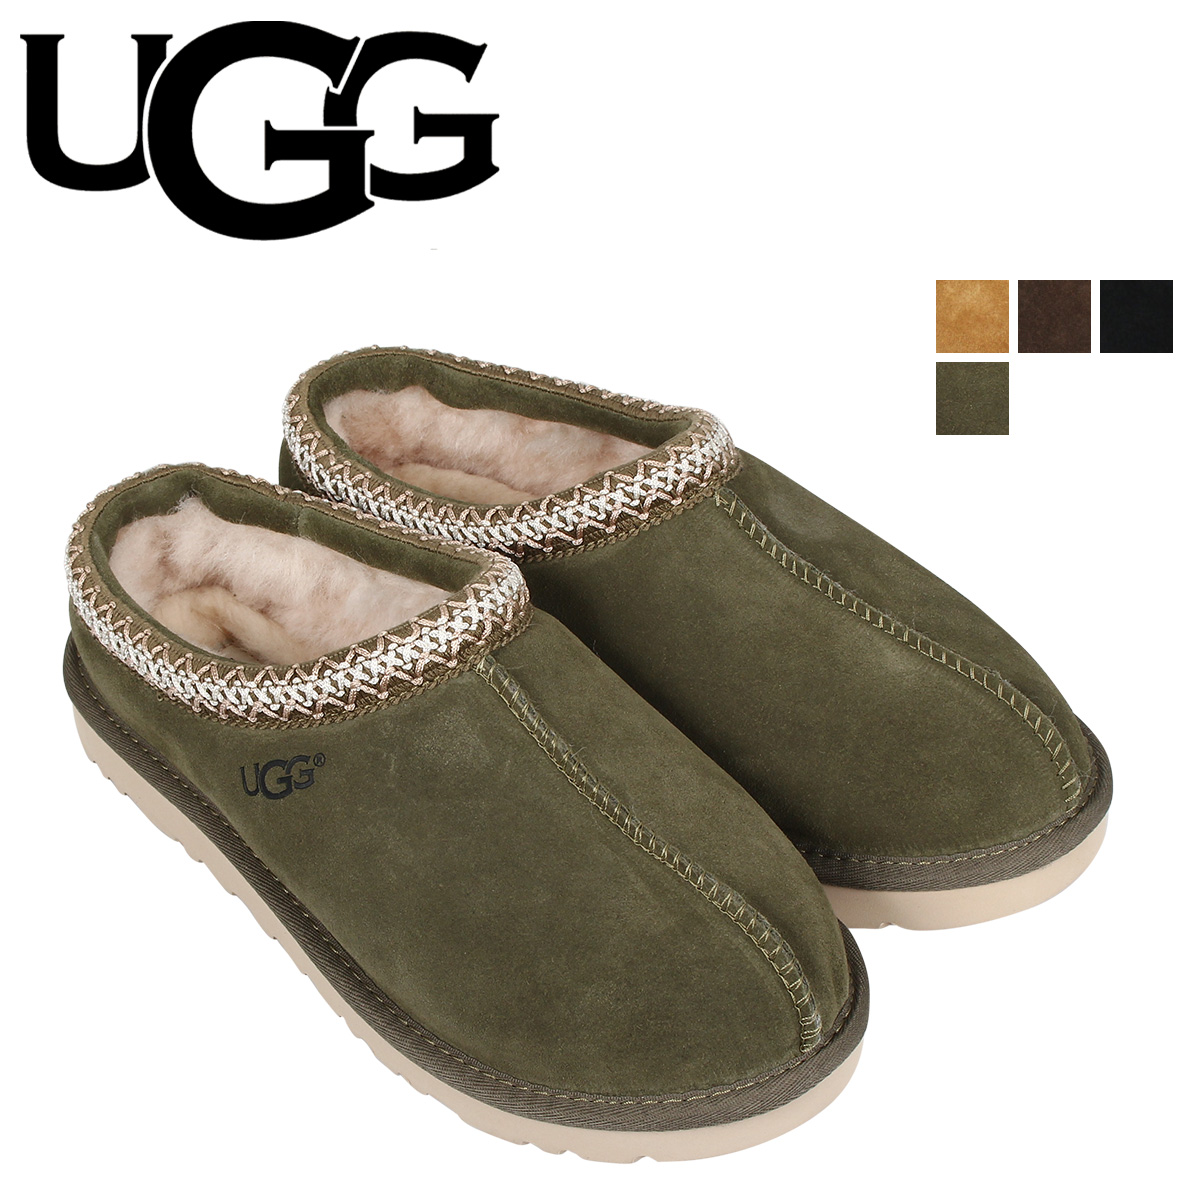 UGG アグ スリッポン ムートン タスマン メンズ シープスキン MENS TASMAN ブラック ブラウン グリーン 黒 5950